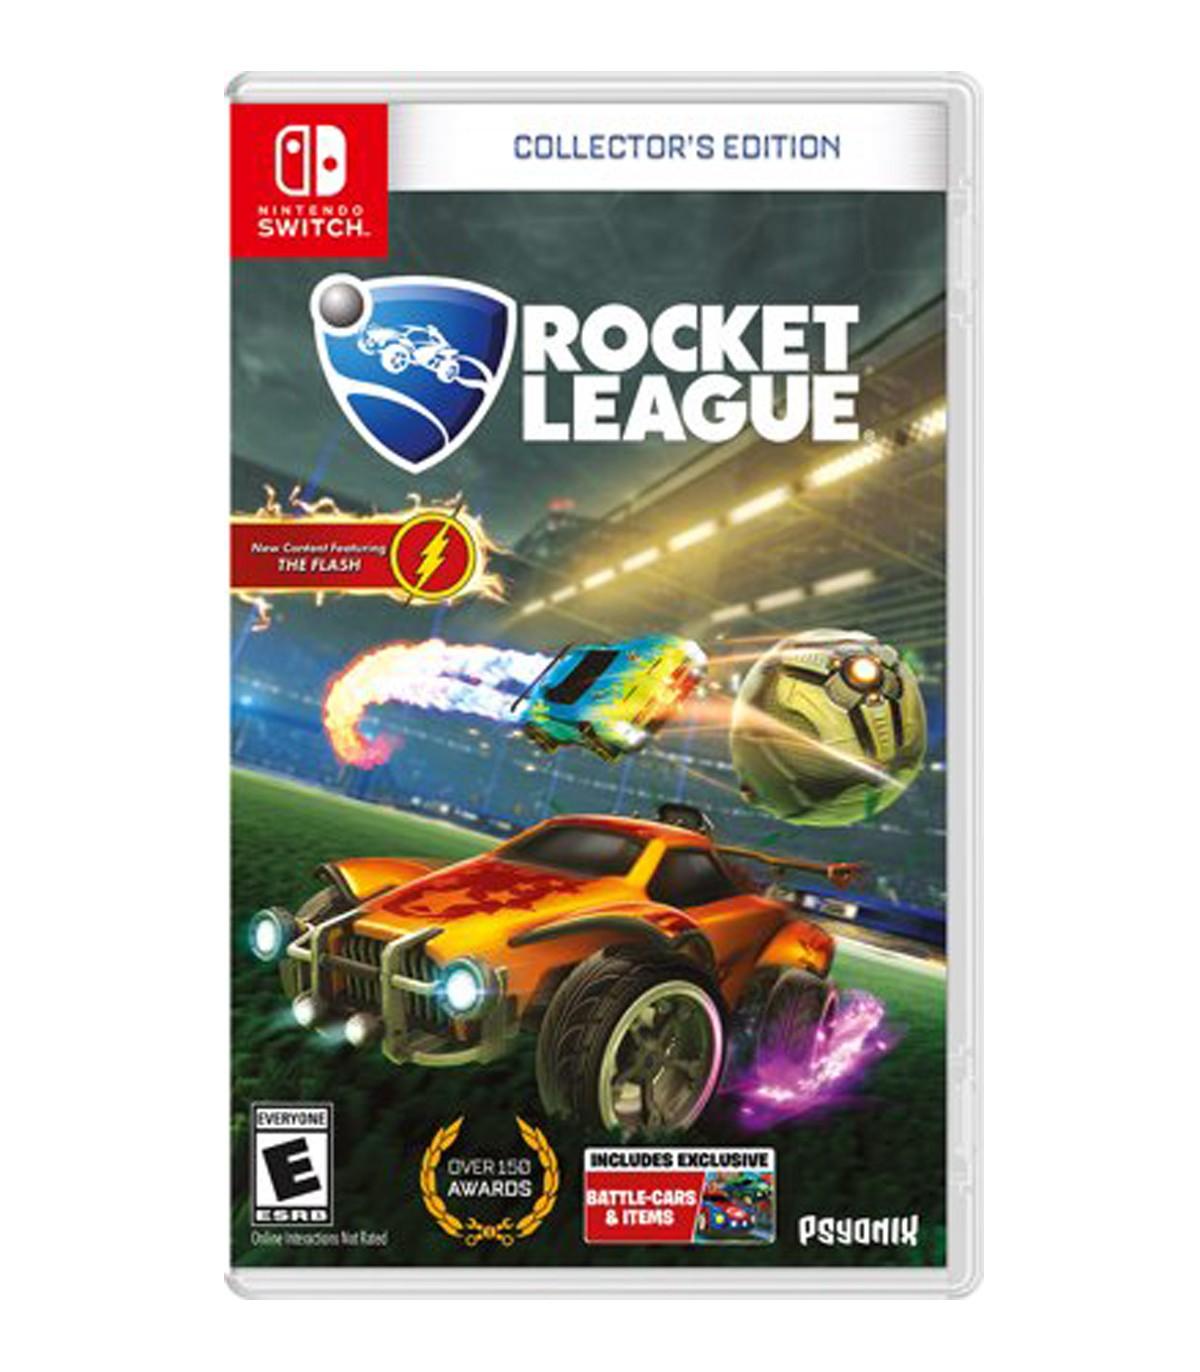 بازی Rocket League: Collector's Edition کارکرده - نینتندو سوییچ